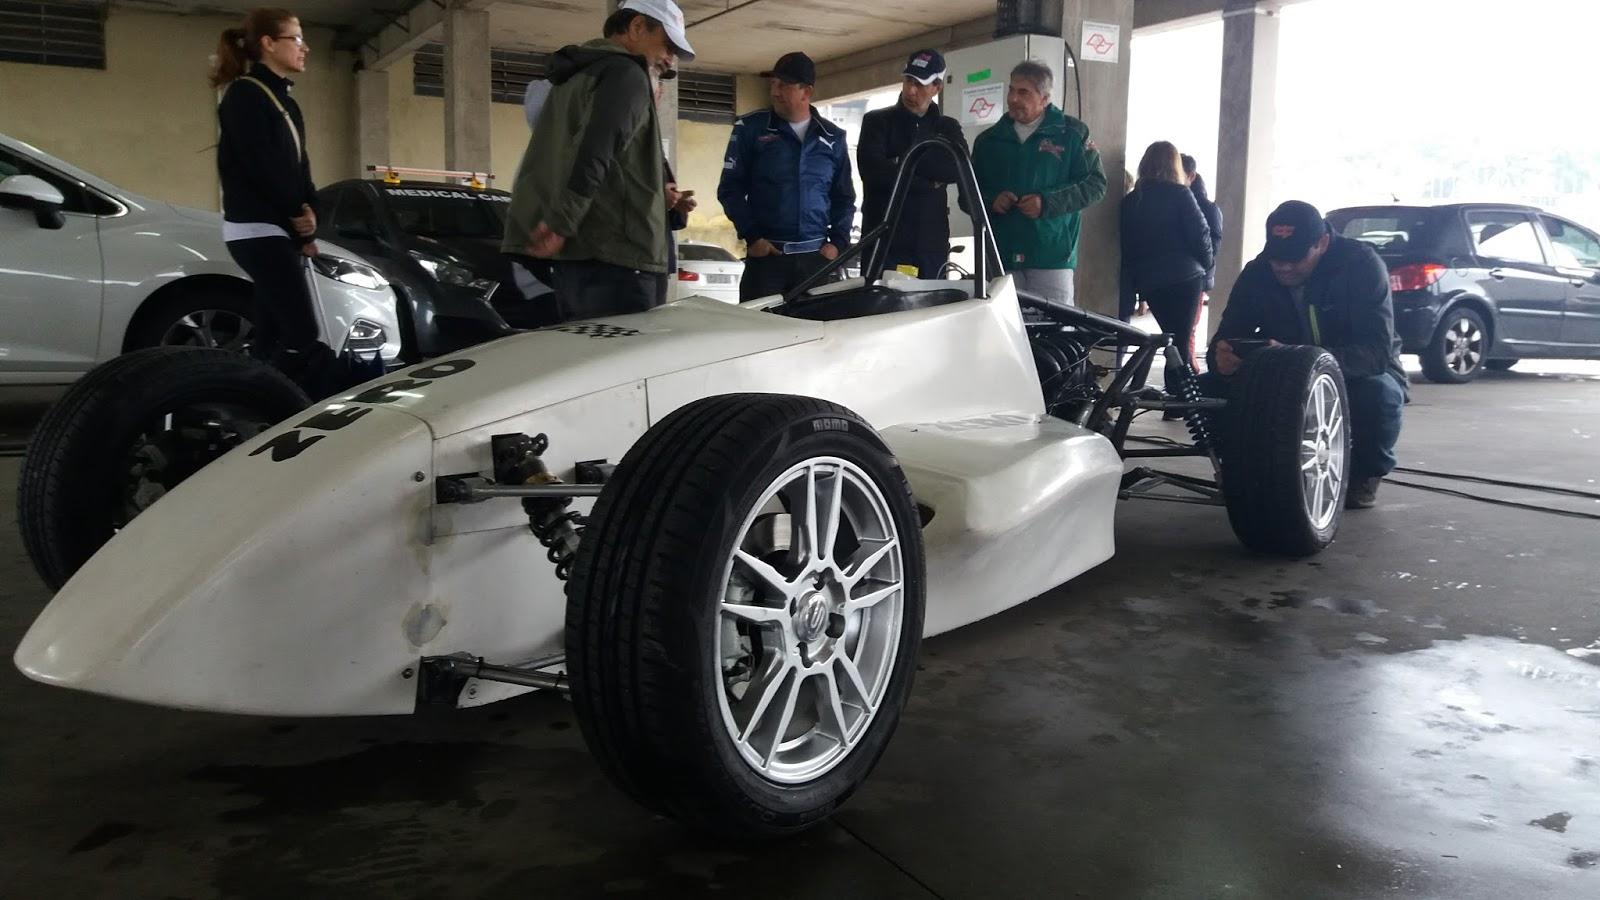 1a8f8bca45 Confira abaixo como ficou o carro protótipo da Fórmula 1600